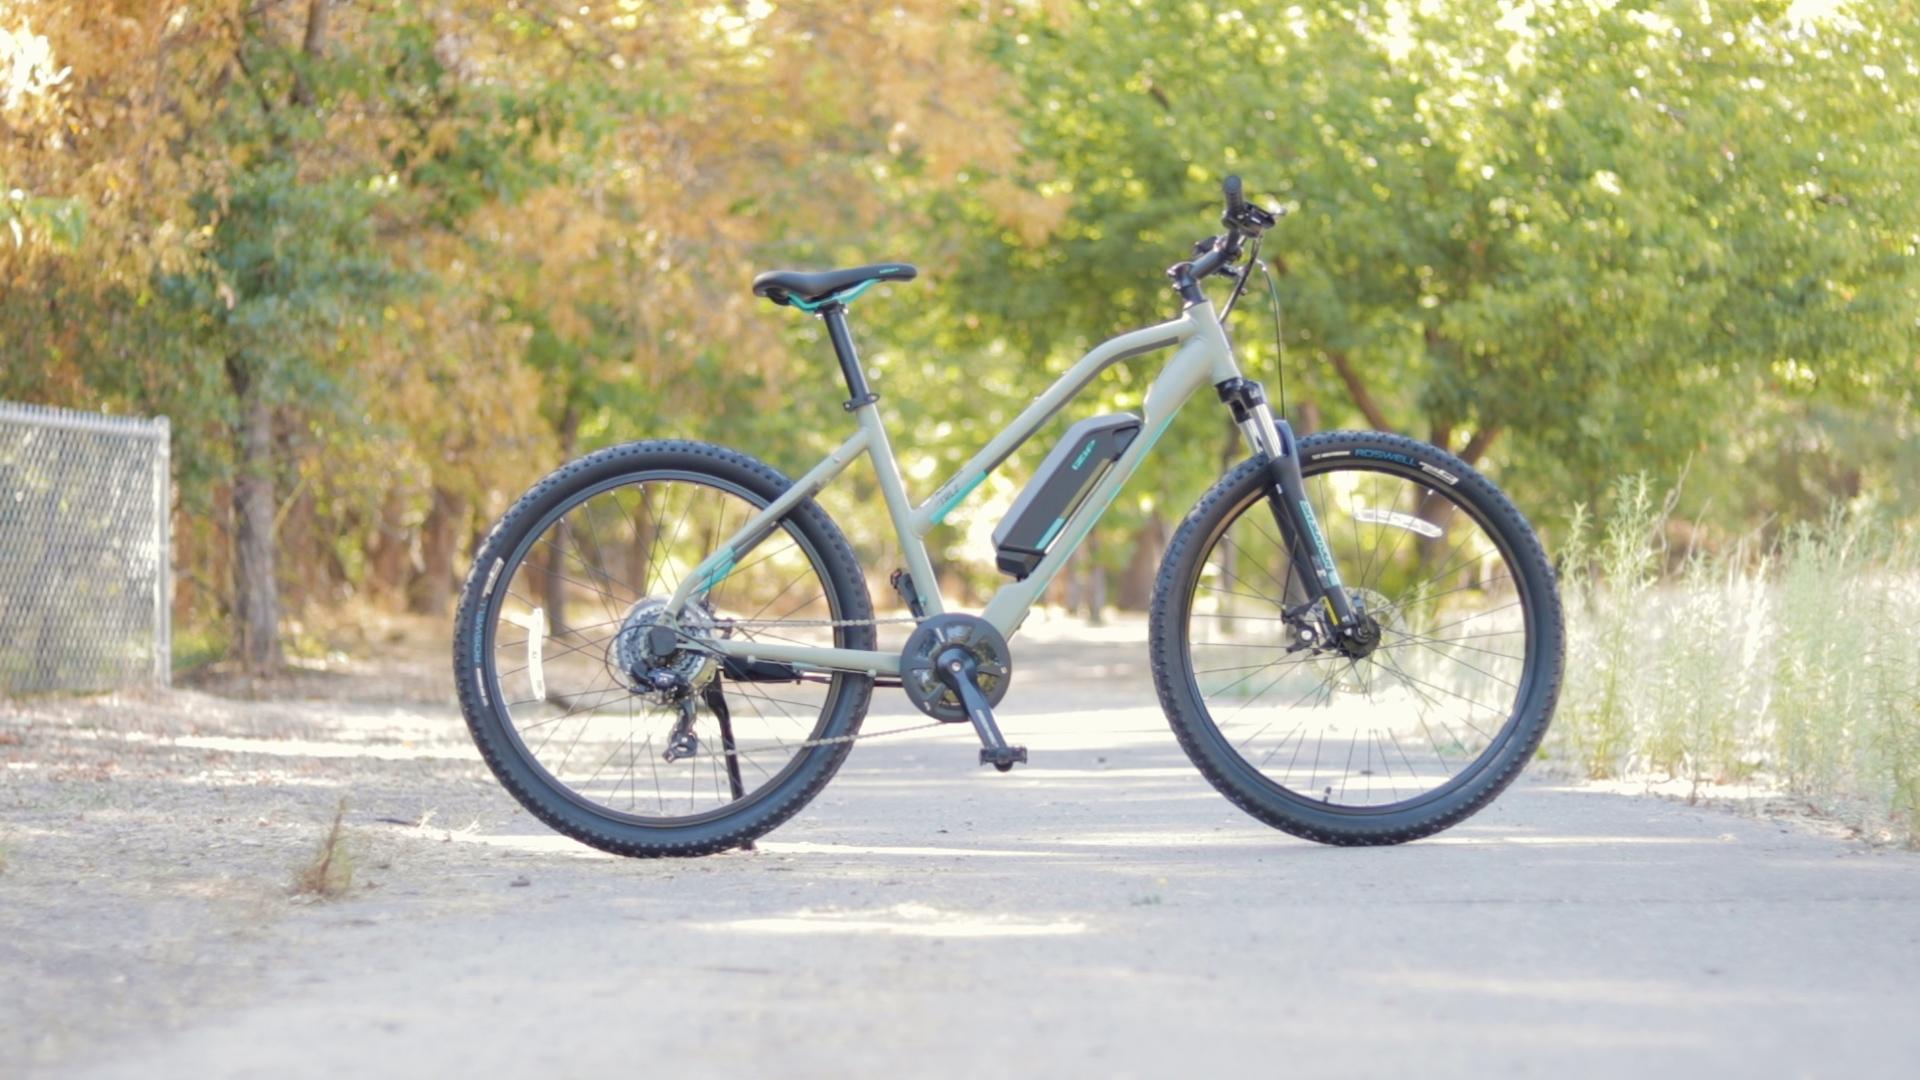 electrified-reviews-izip-trlz-electric-bike-review-profile.jpg